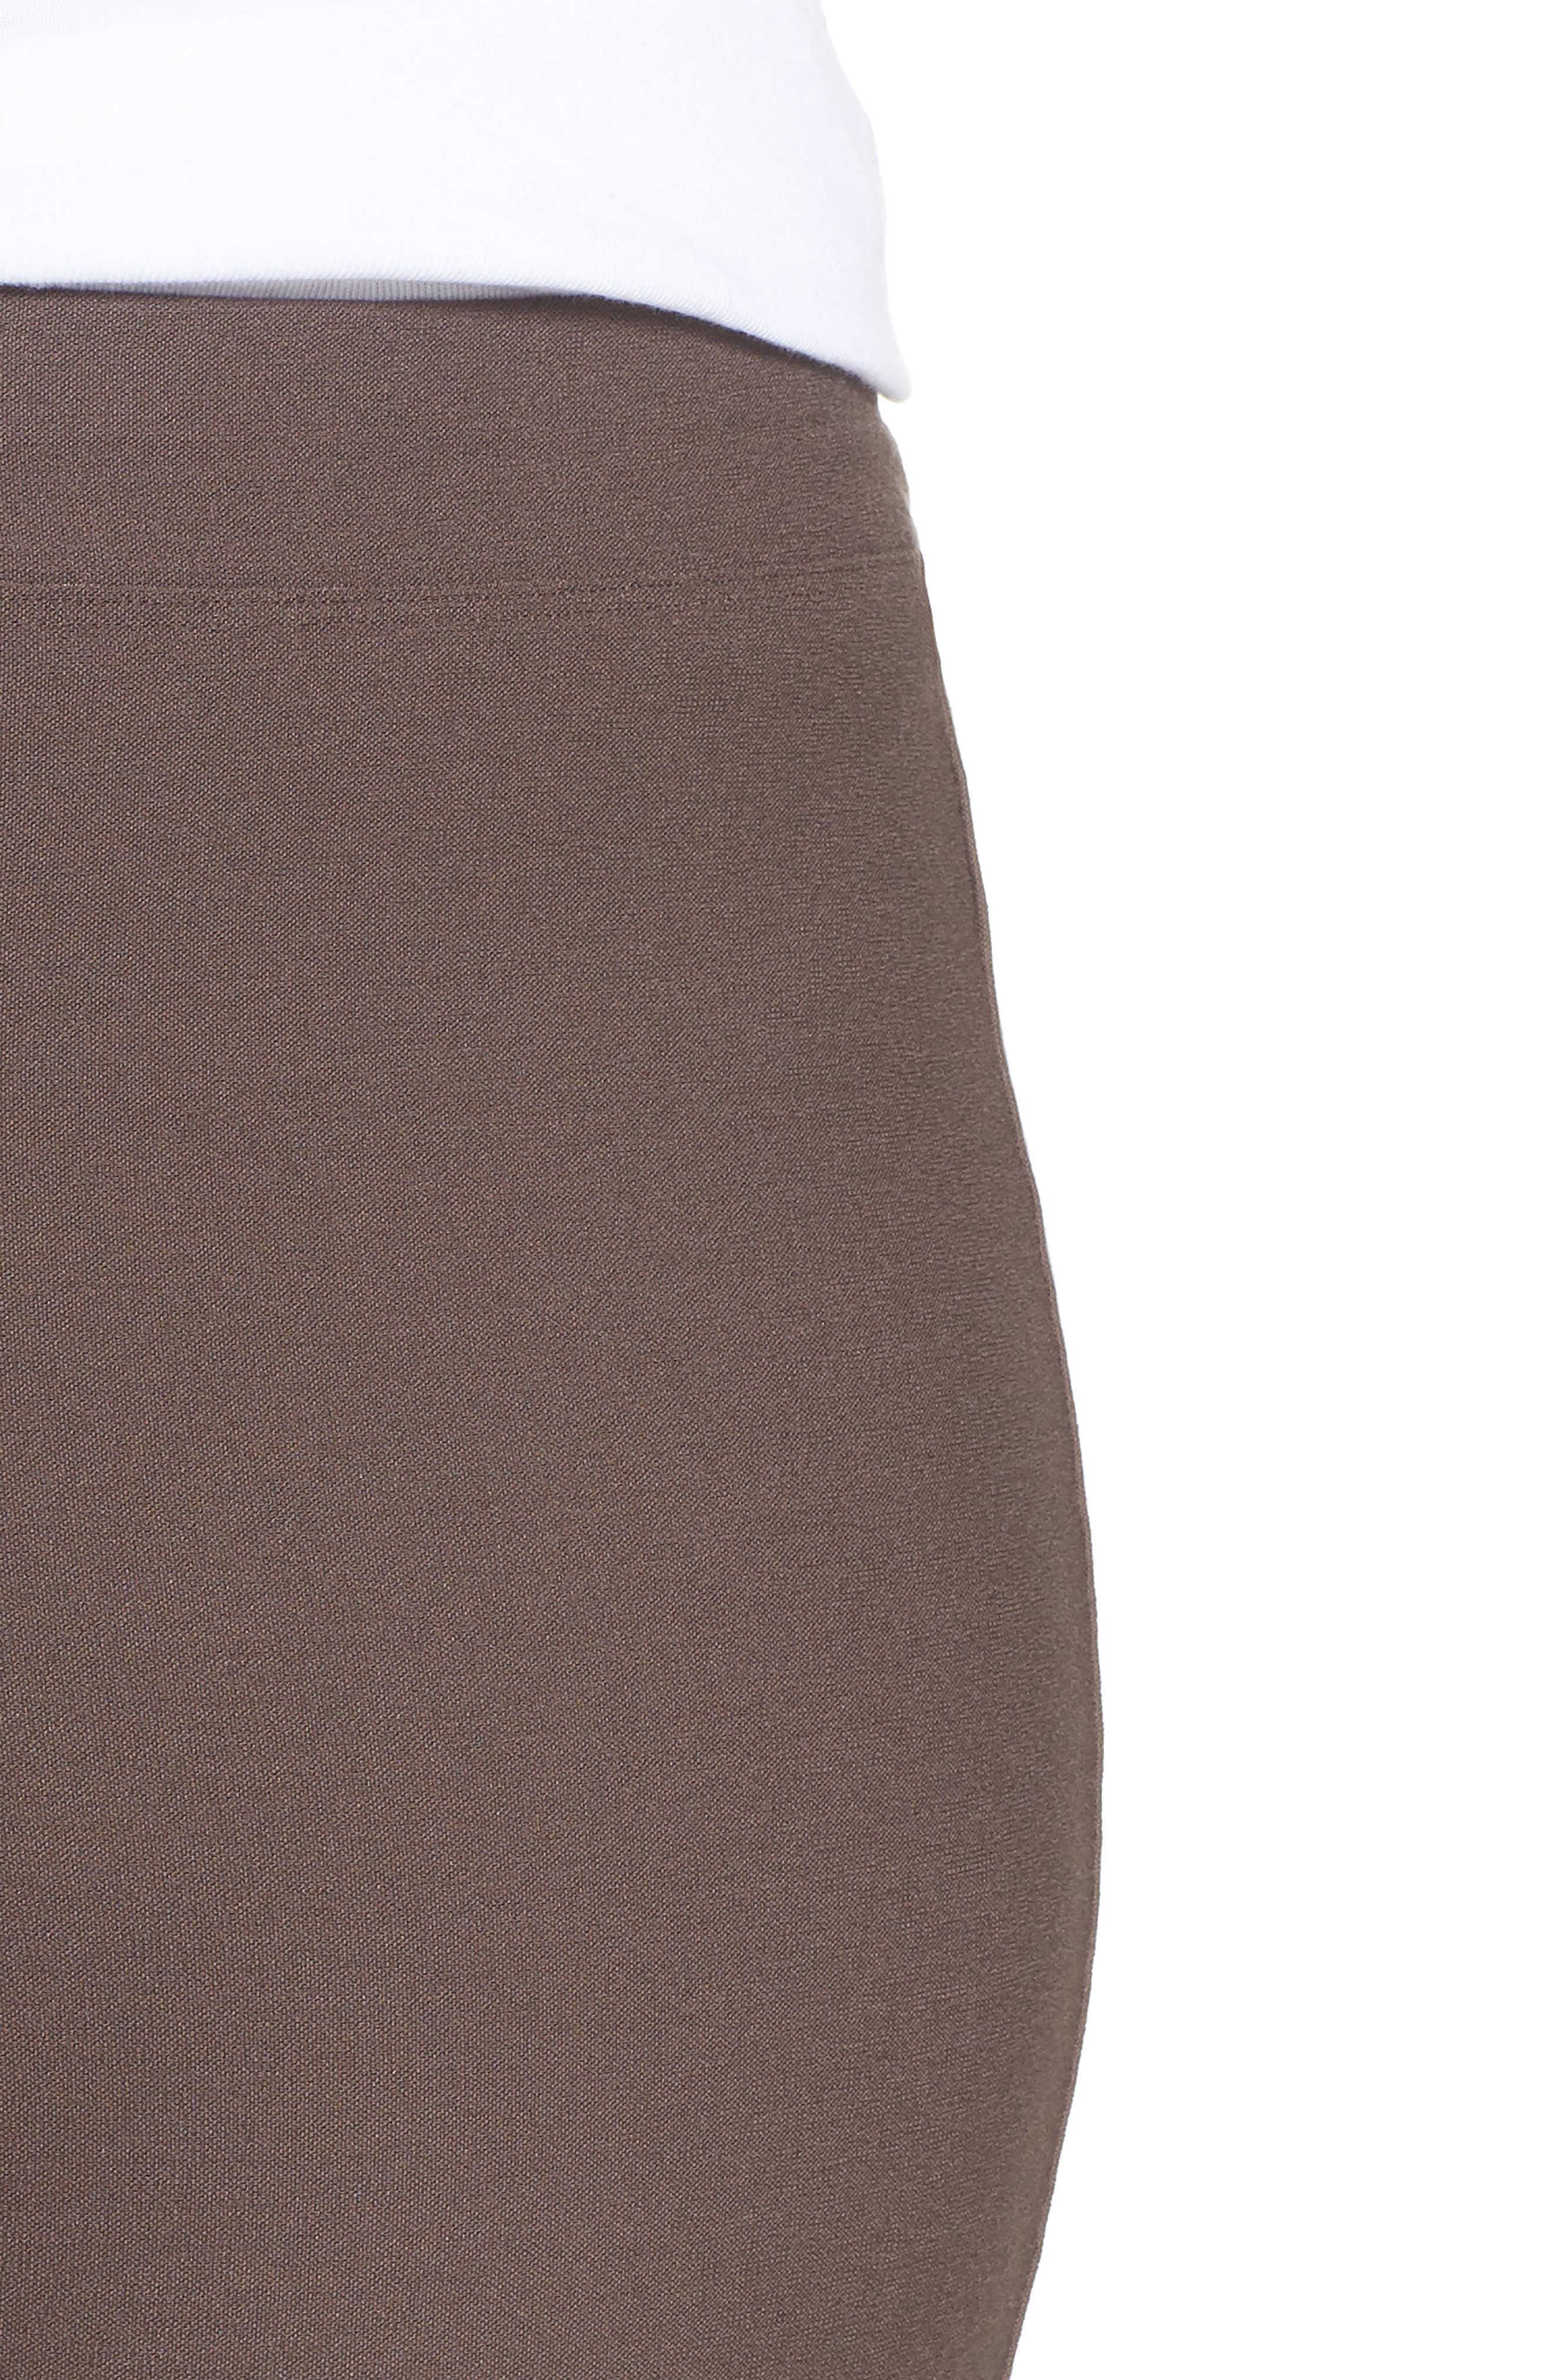 Slim Ankle Pants,                             Alternate thumbnail 57, color,